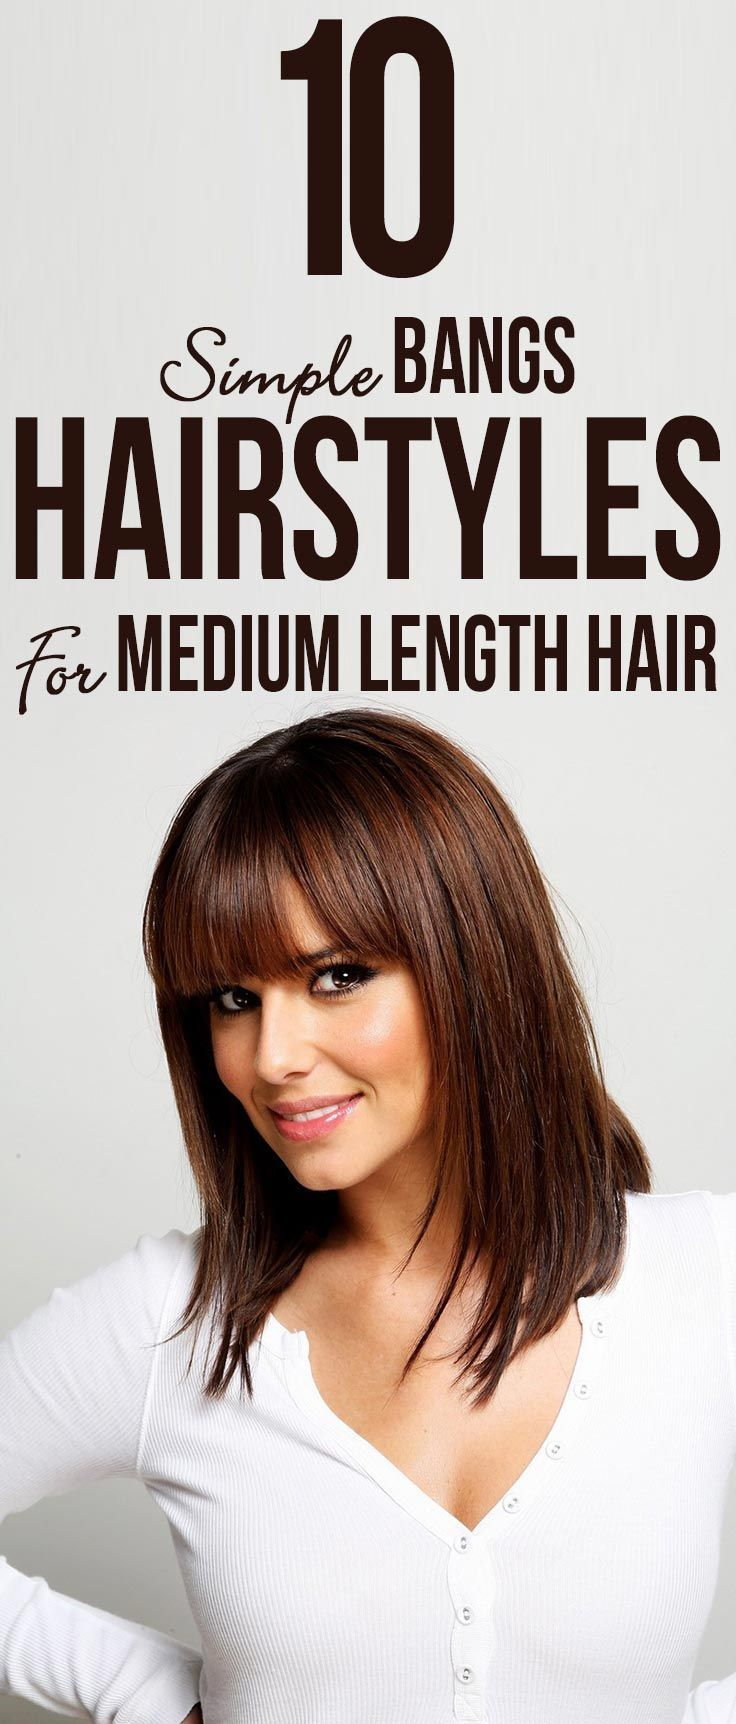 Simple Bangs Hairstyles For Medium Length Hair Bang hairstyles